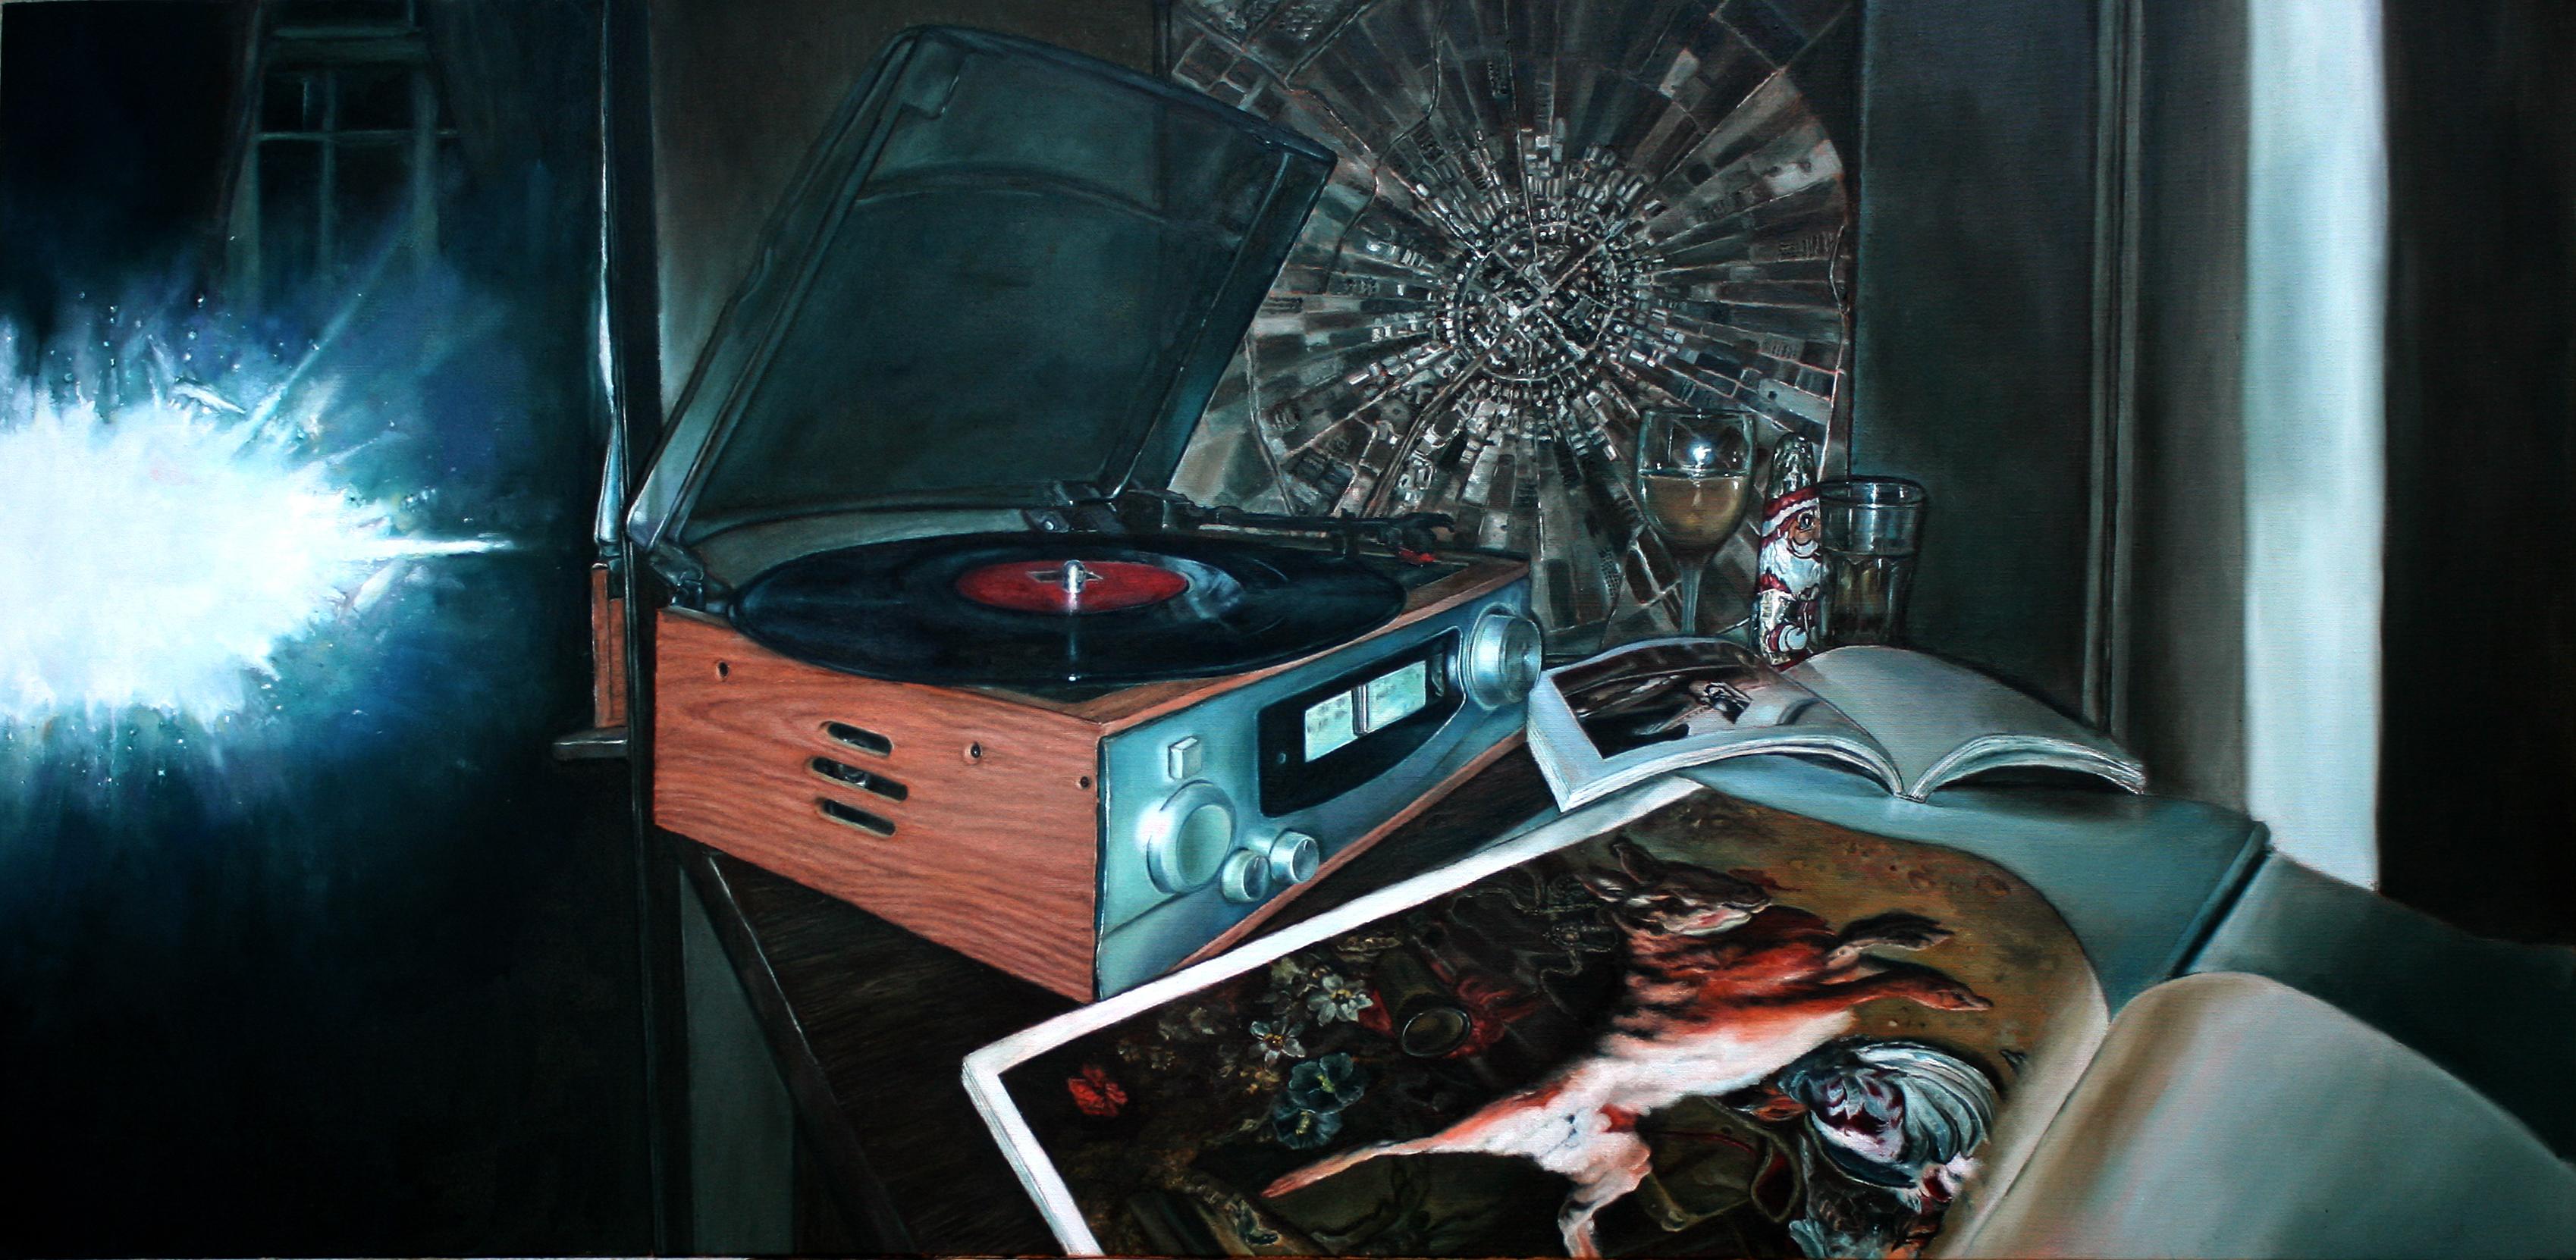 vanitas oil on canvas 120x55 cm